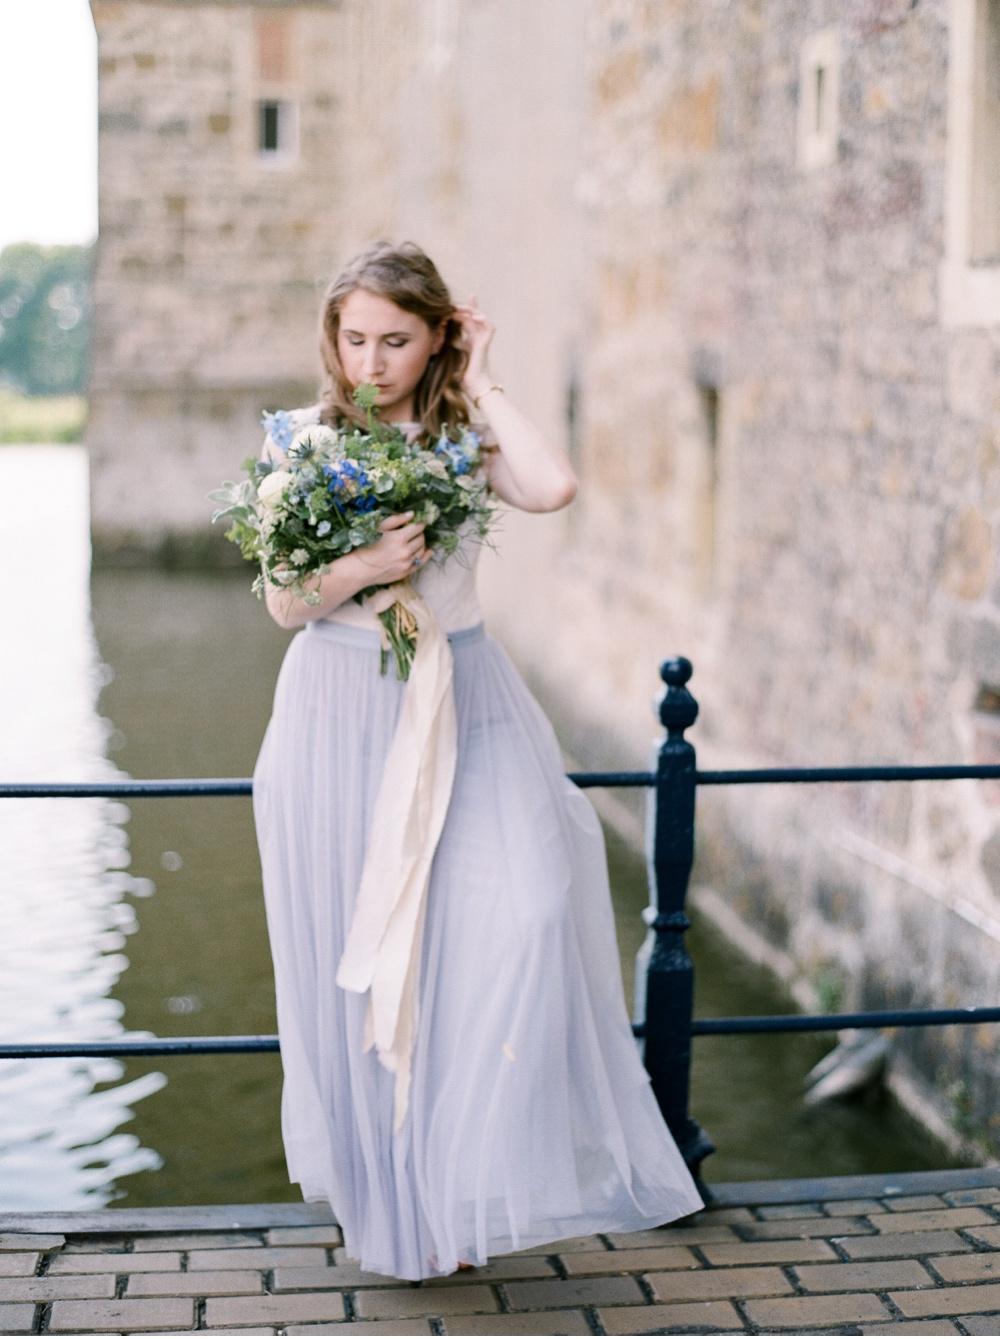 NRW_Hochzeitsfotograf©MadalinaSheldon_0005.jpg